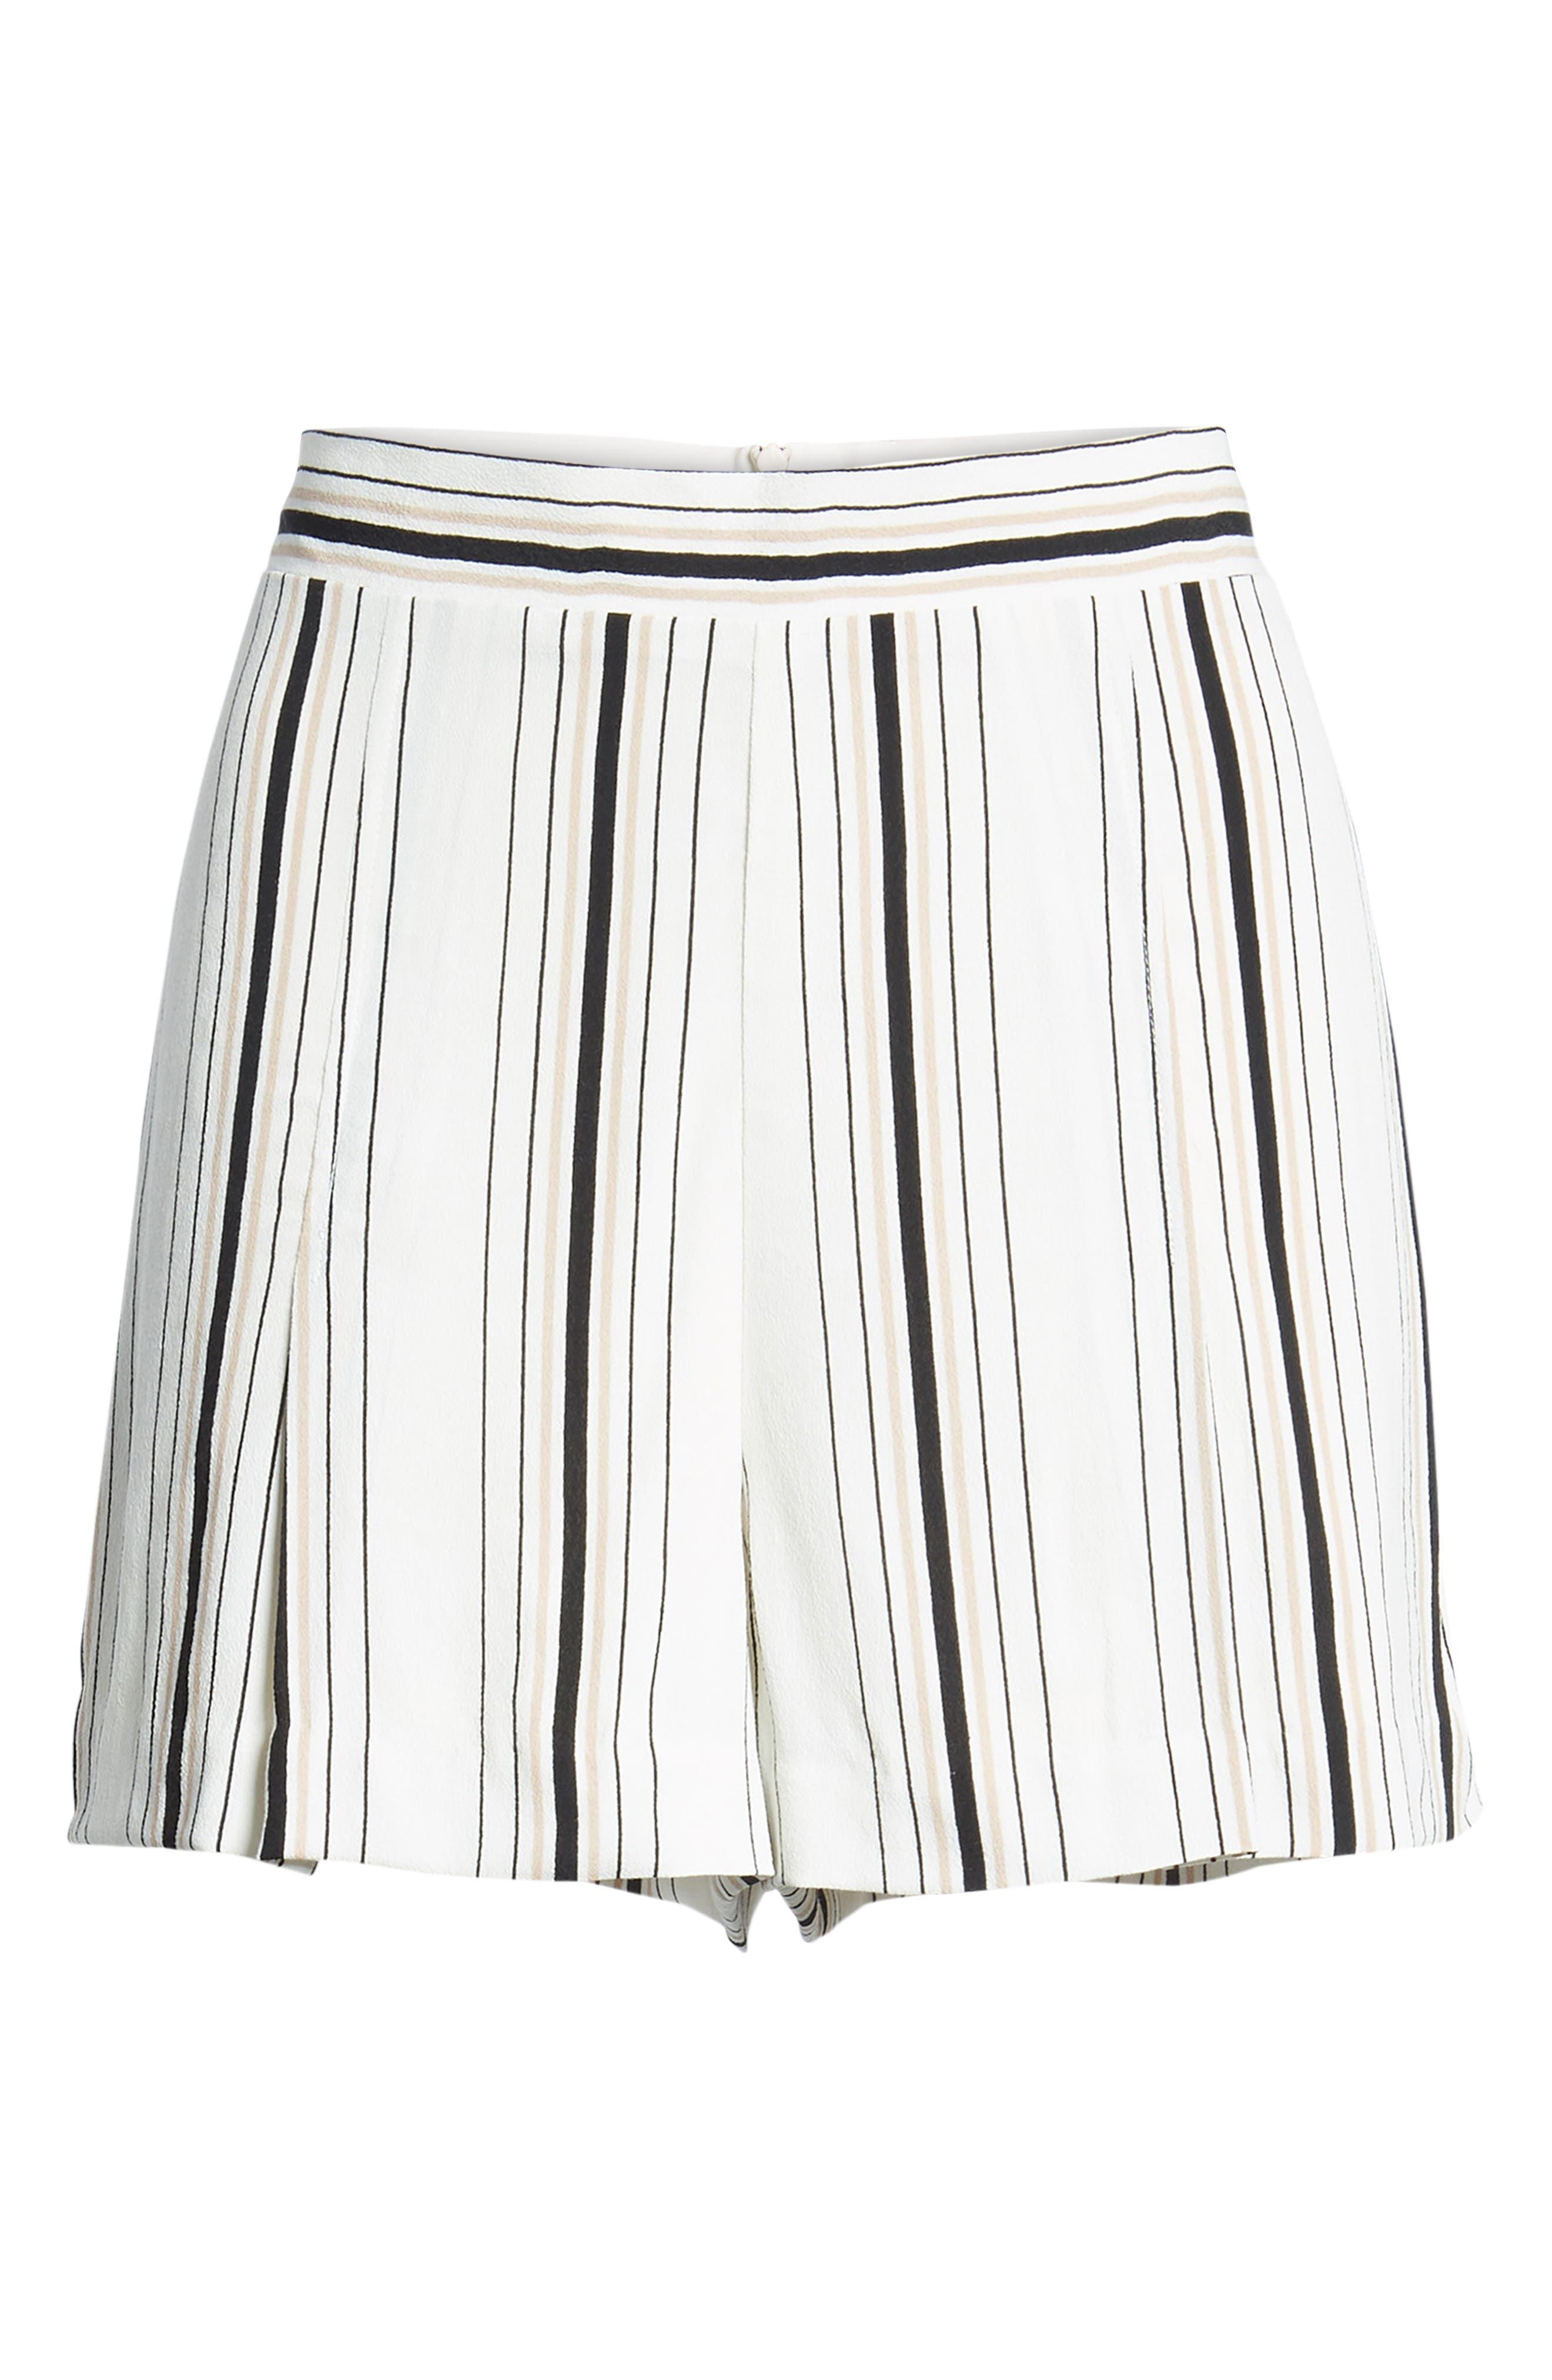 Stripe High Waist Woven Shorts,                             Alternate thumbnail 6, color,                             900